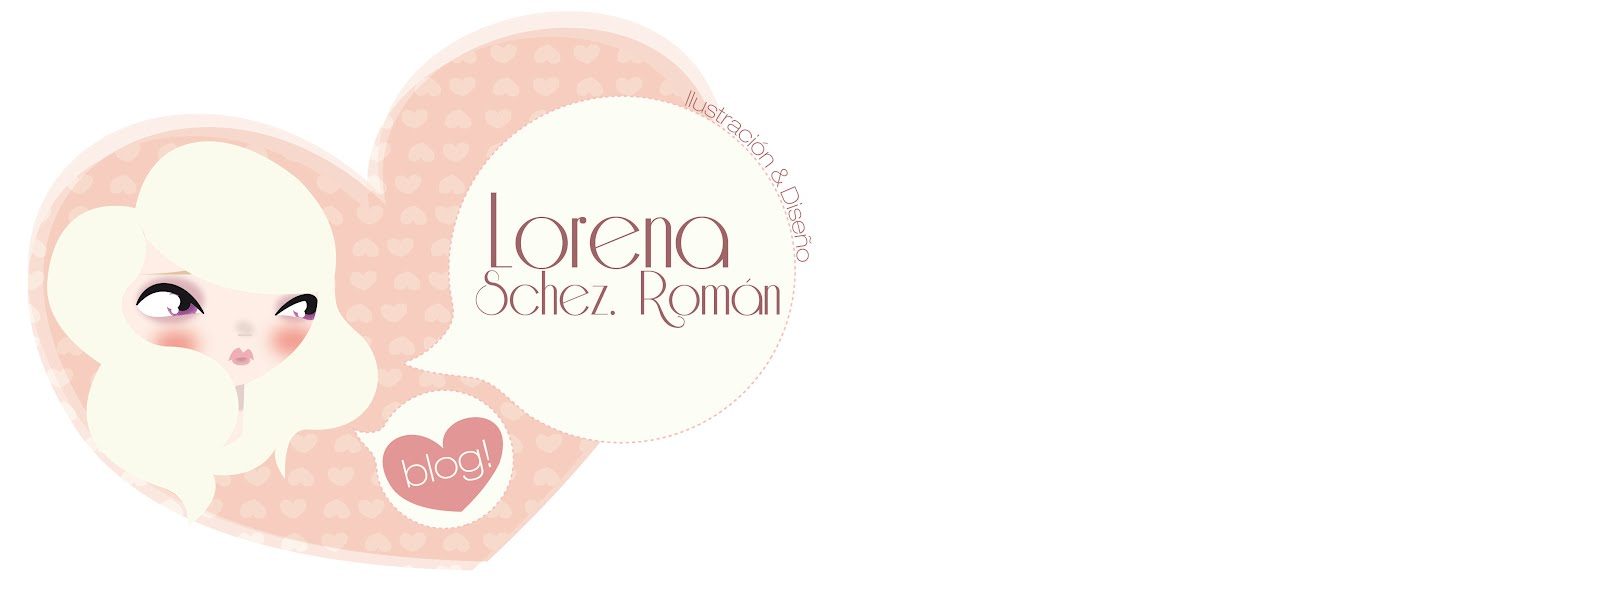 Lorena Schez. Román